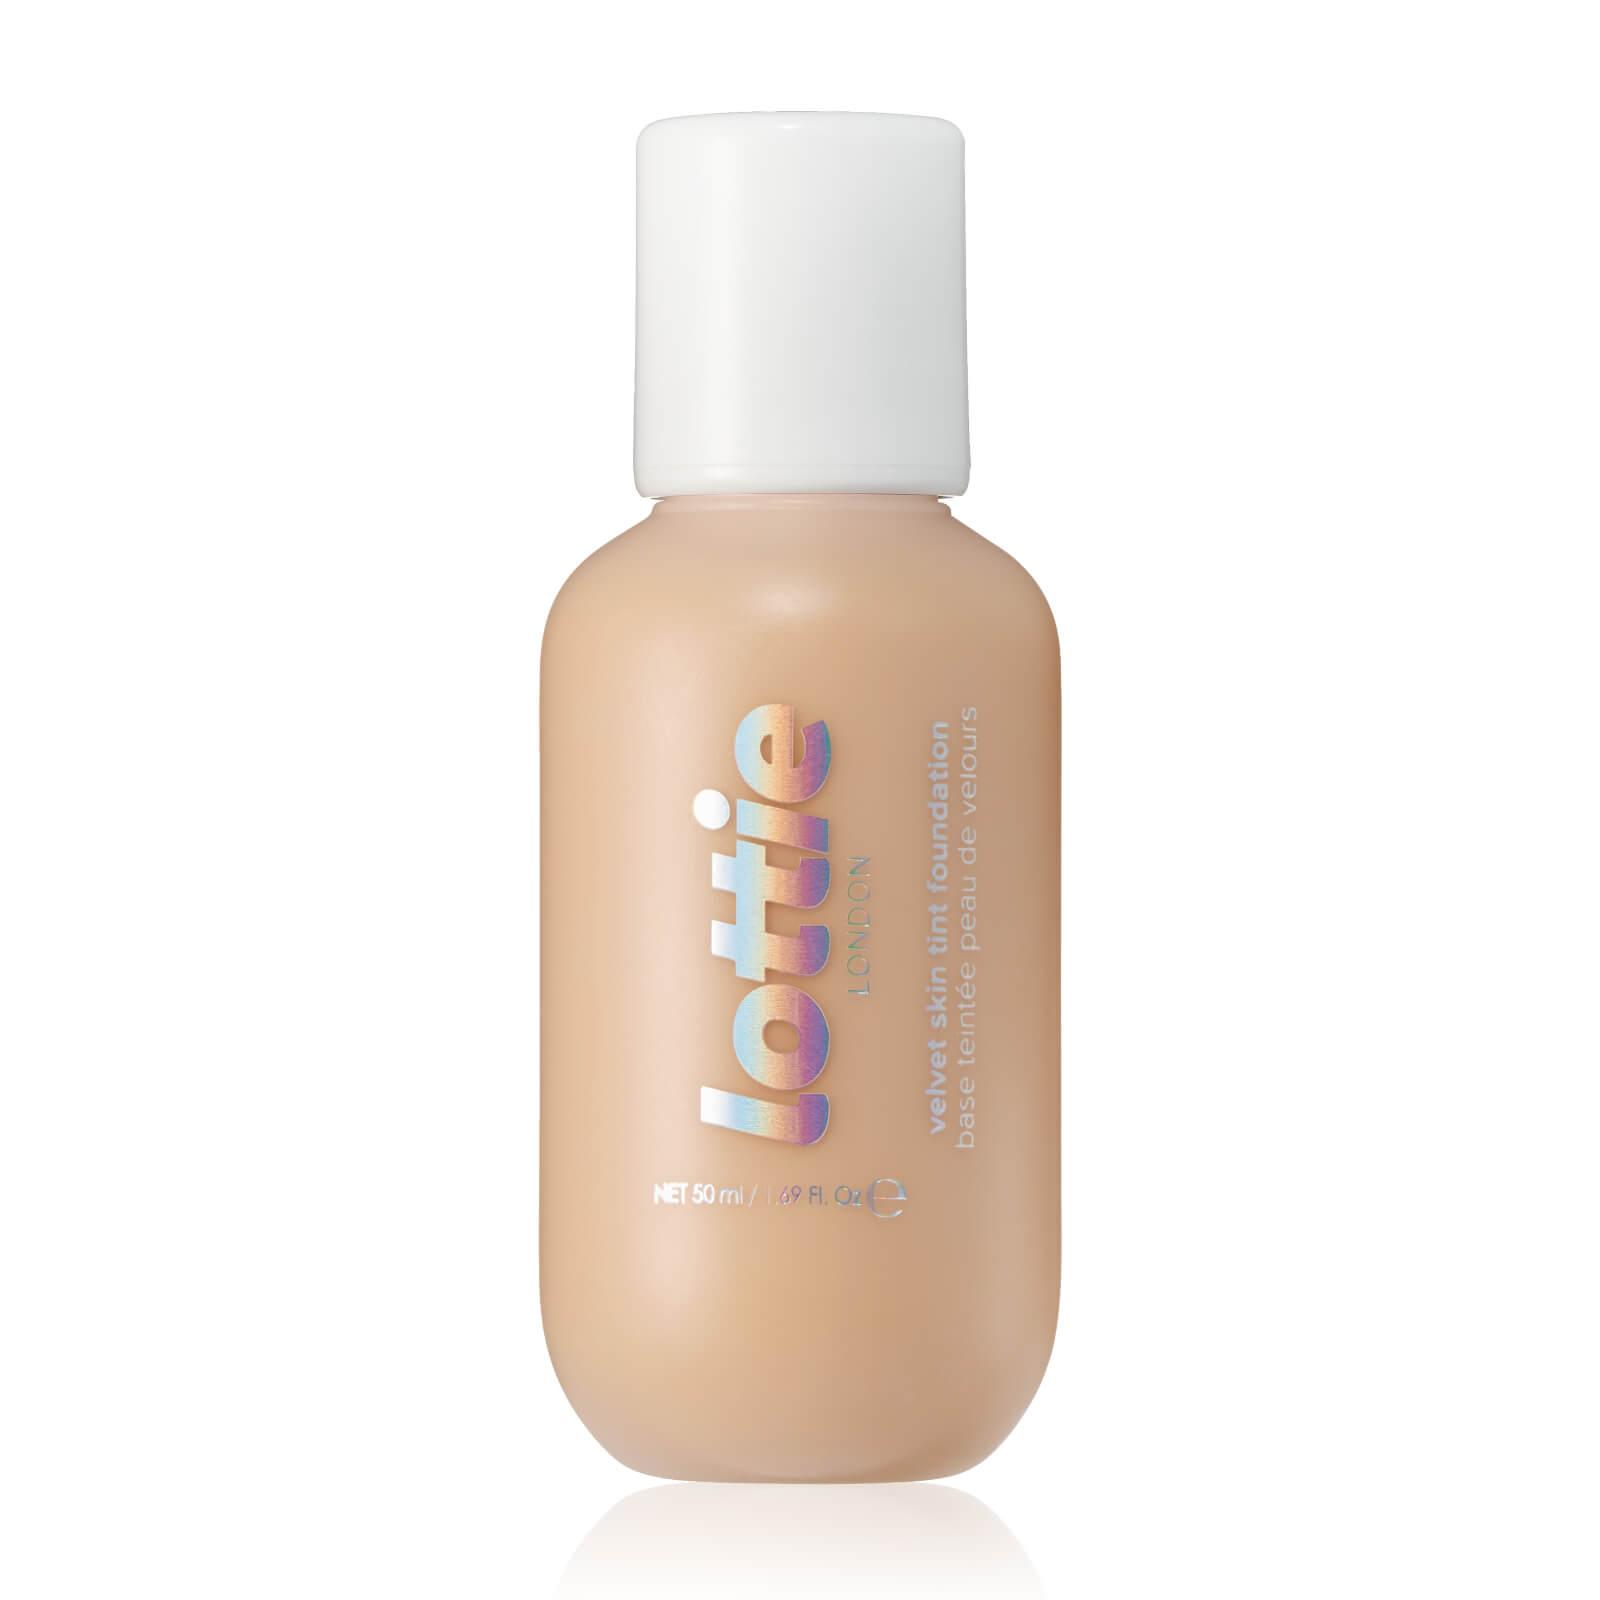 Купить Lottie London Velvet Skin Tint (Various Shades) - Medium N025